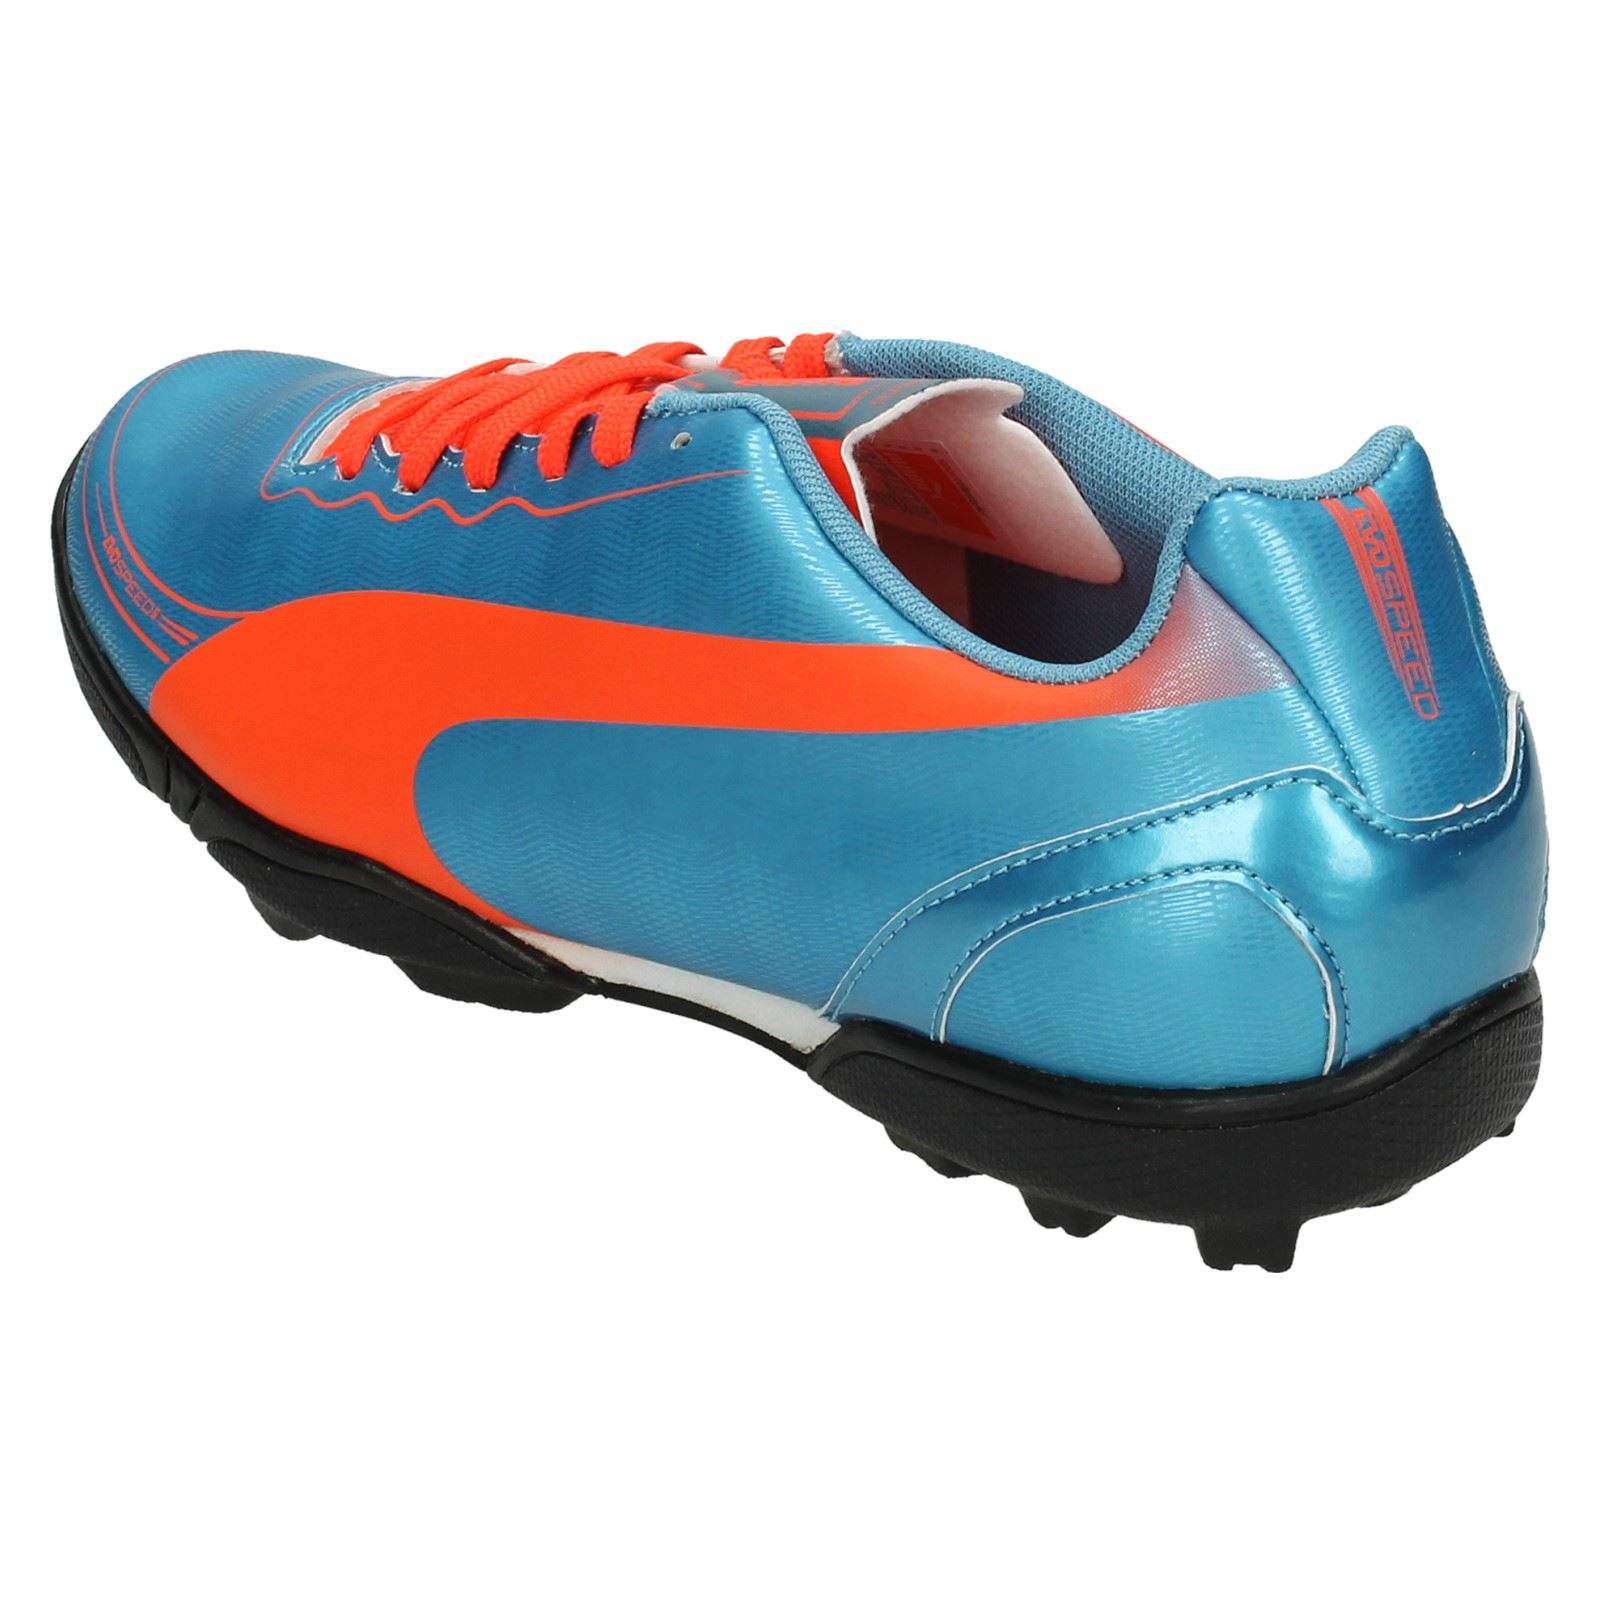 Boys Evo 2 Junior Speed Turf Astro durazno Entrenadores Tt amarillo 5 sintéticos de Puma Jr Sharks azul fútbol Azul f8dqzP8